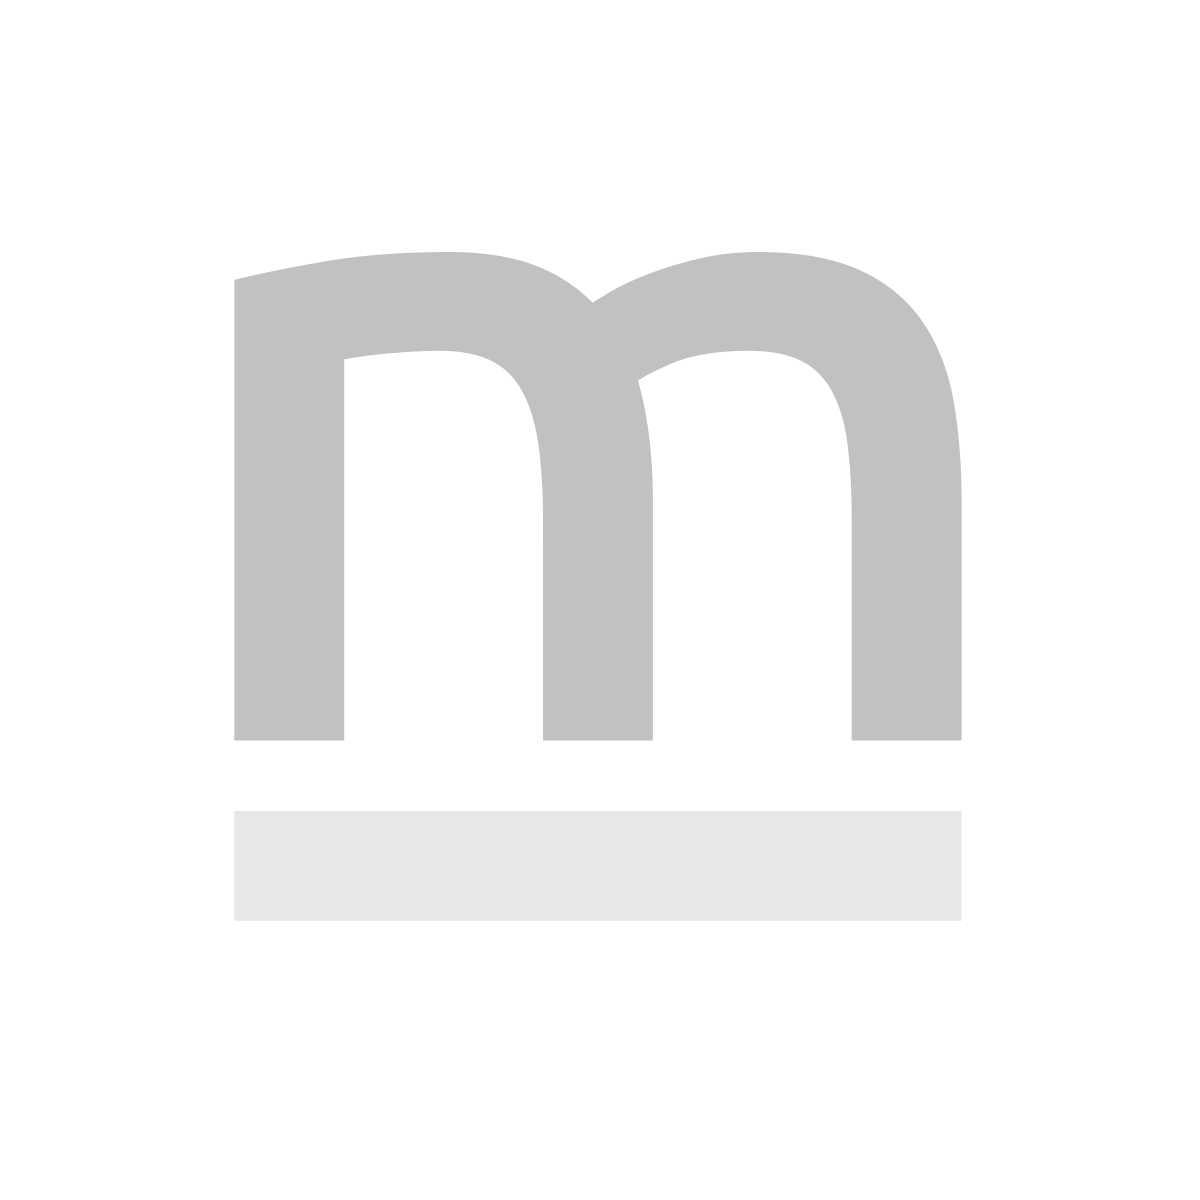 Krzesło CLAUDINE 1 VELVET morskie